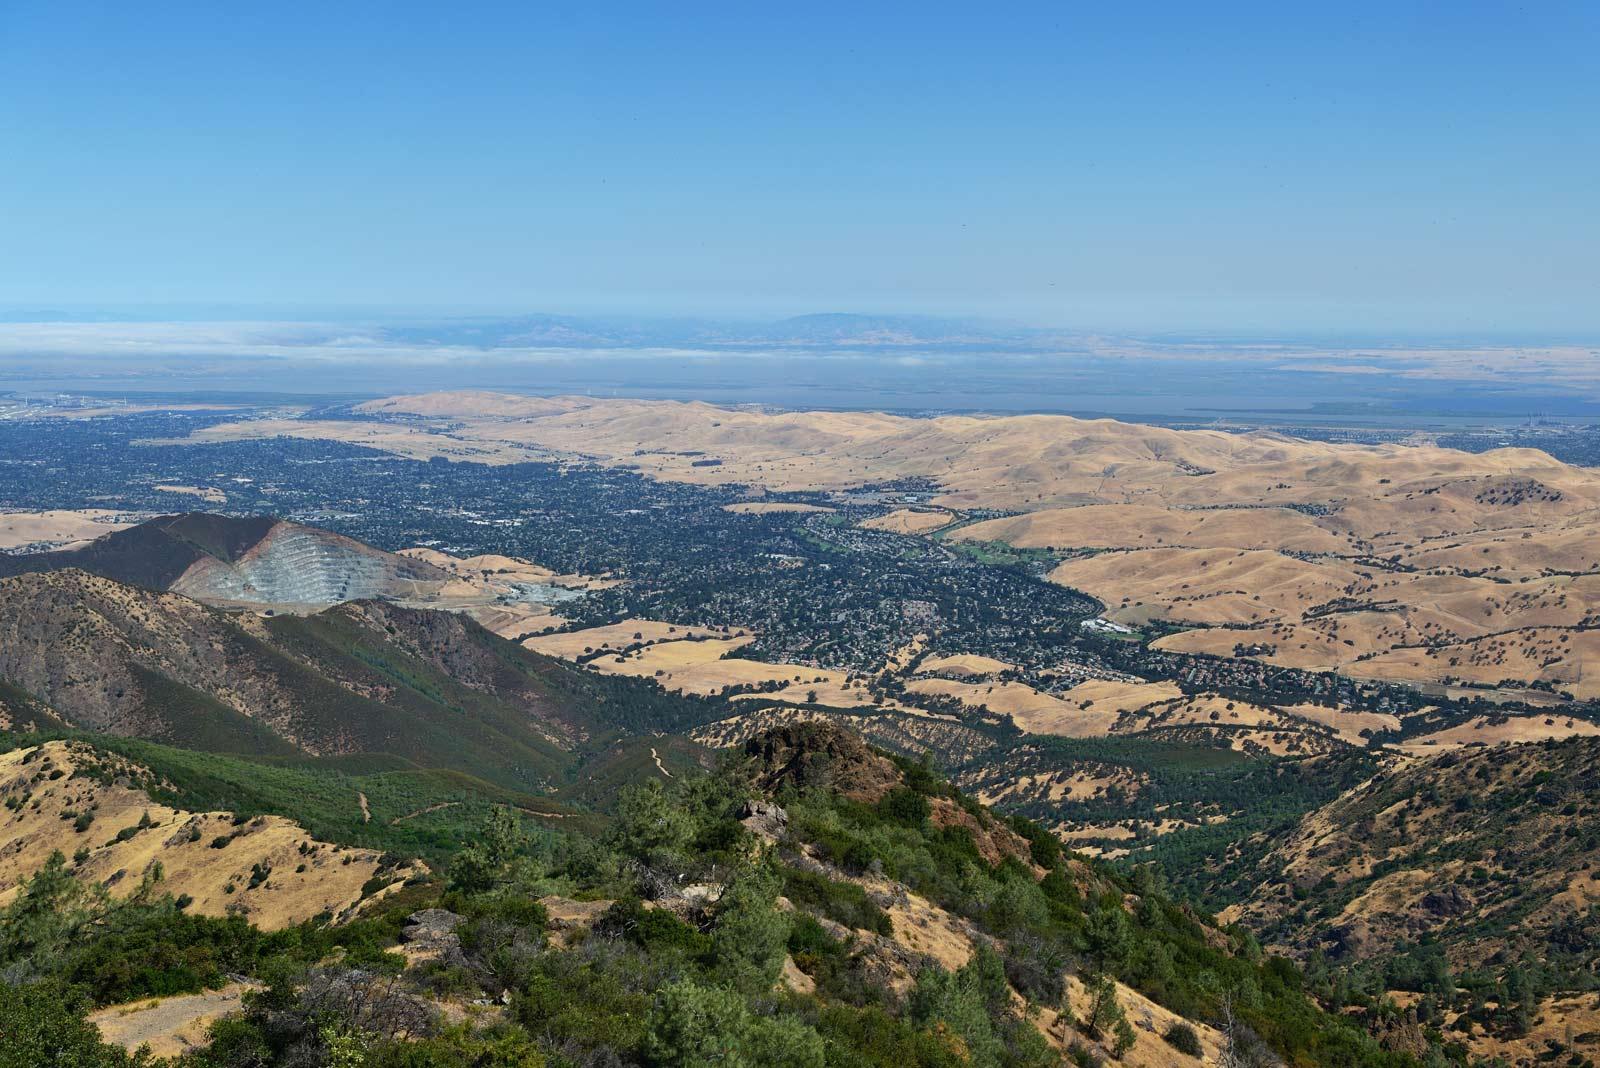 Hiking Trails in Mount Diablo State Park San Francisco